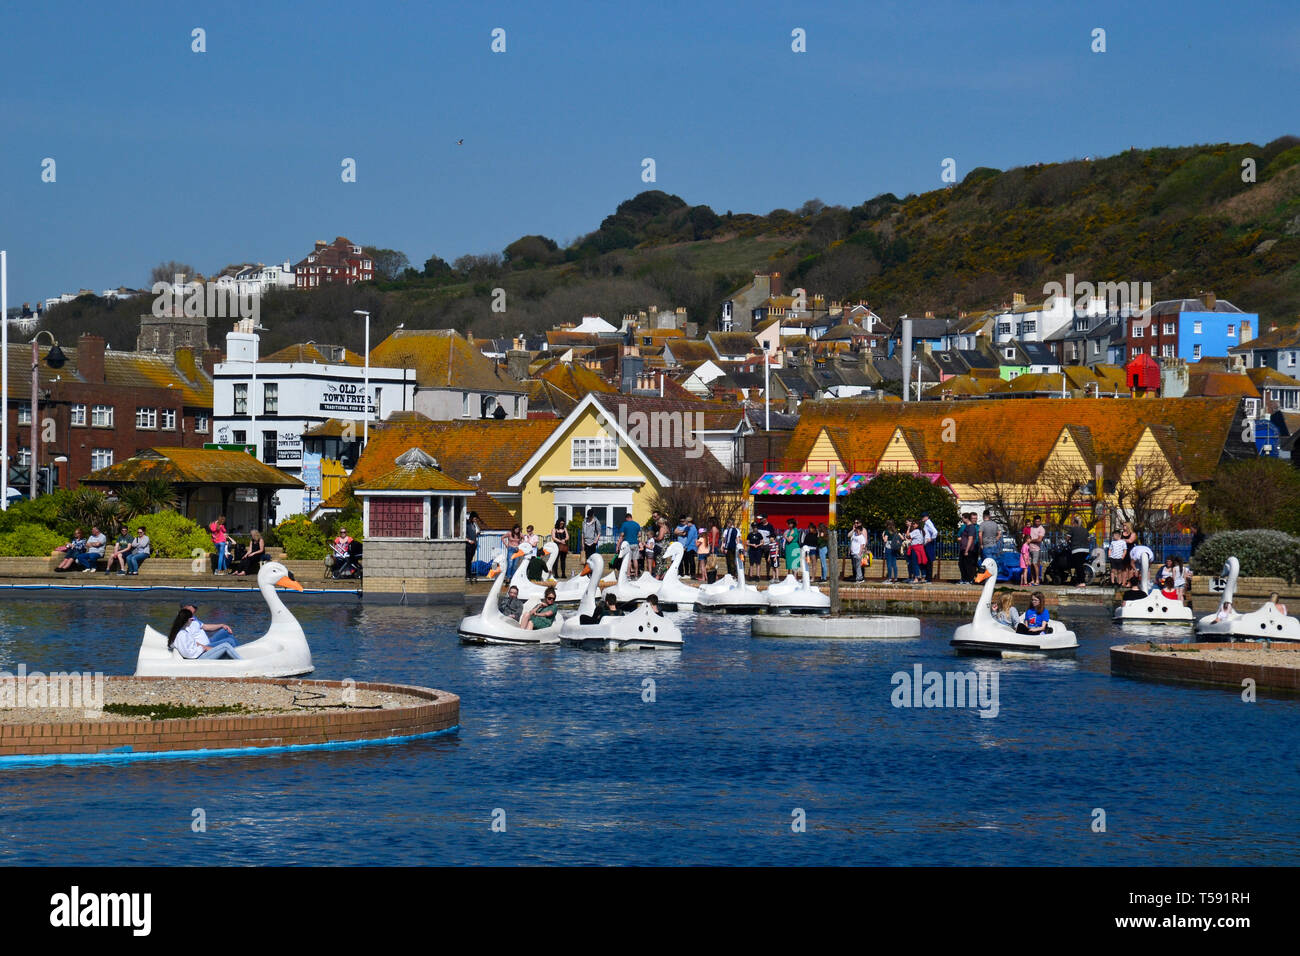 Hastings, East Sussex, UK Stock Photo